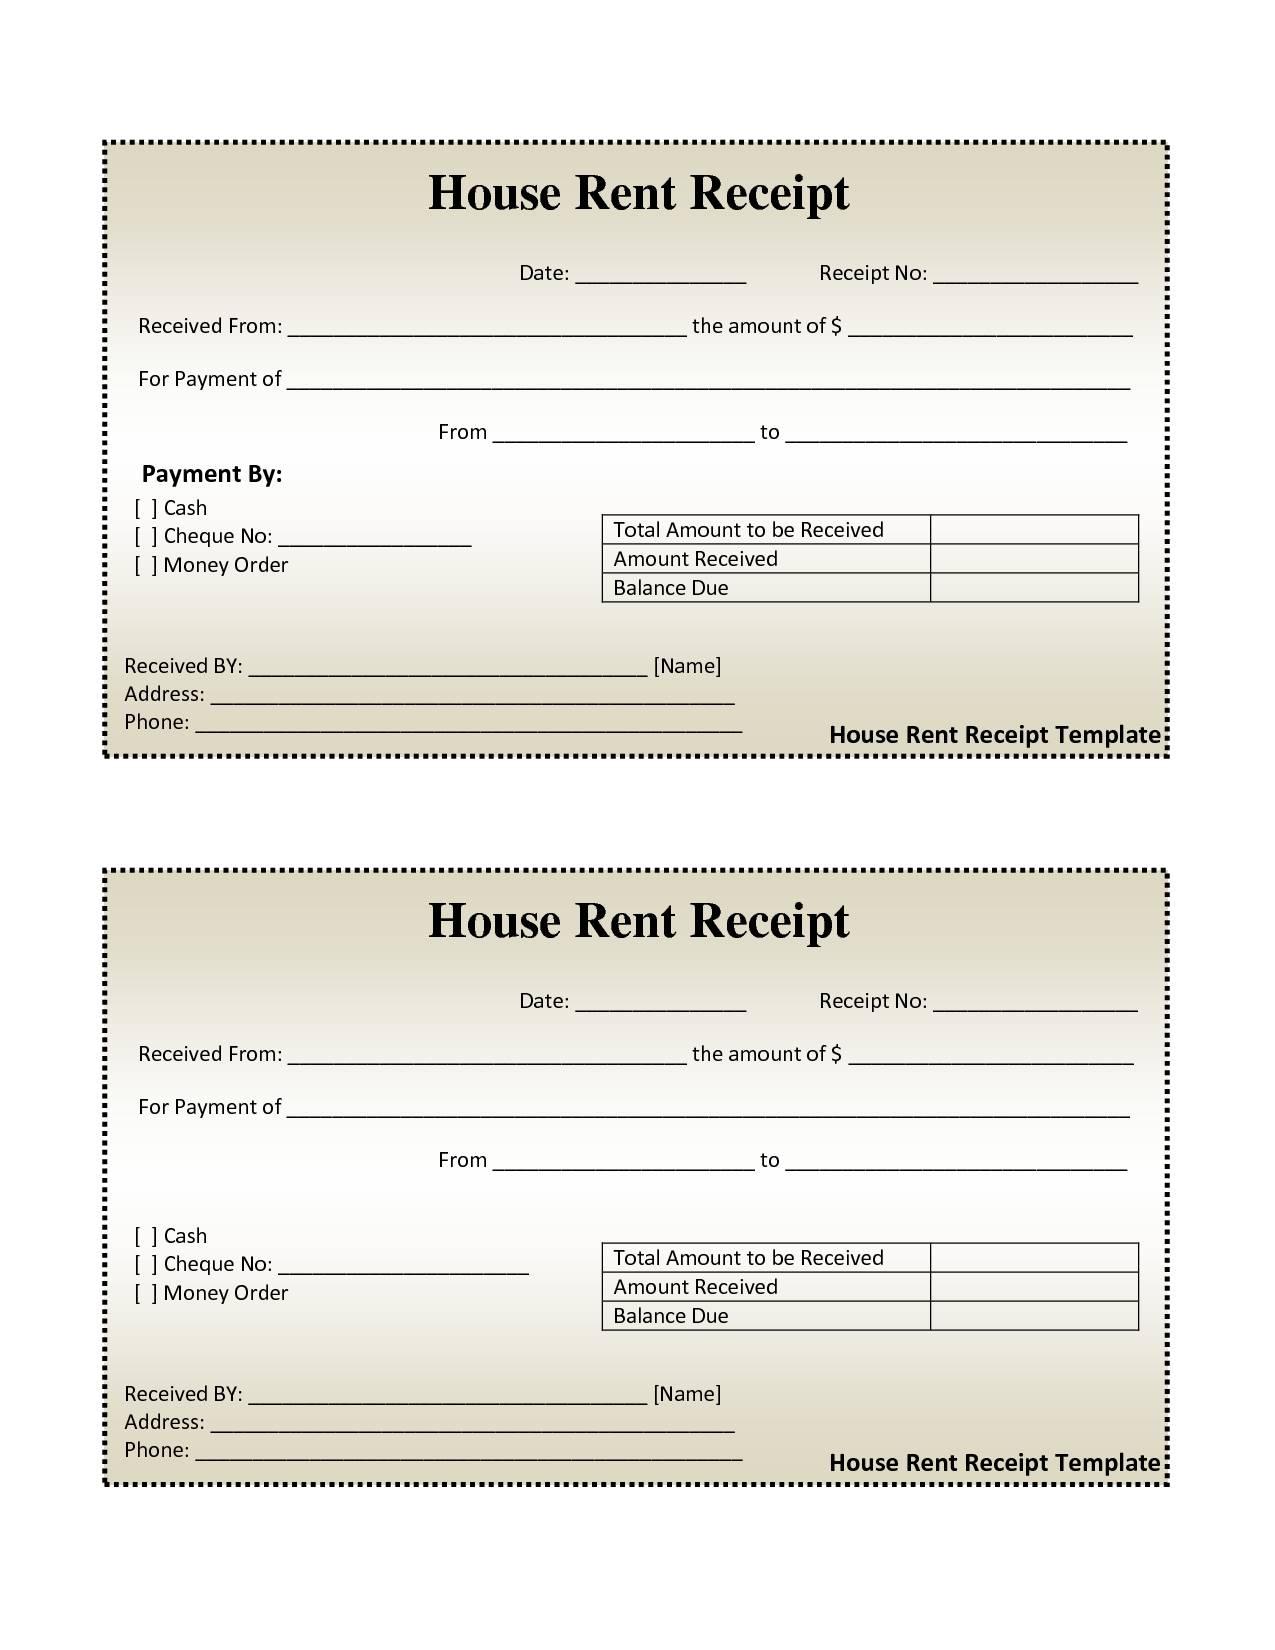 Invoice Receipt Template Free